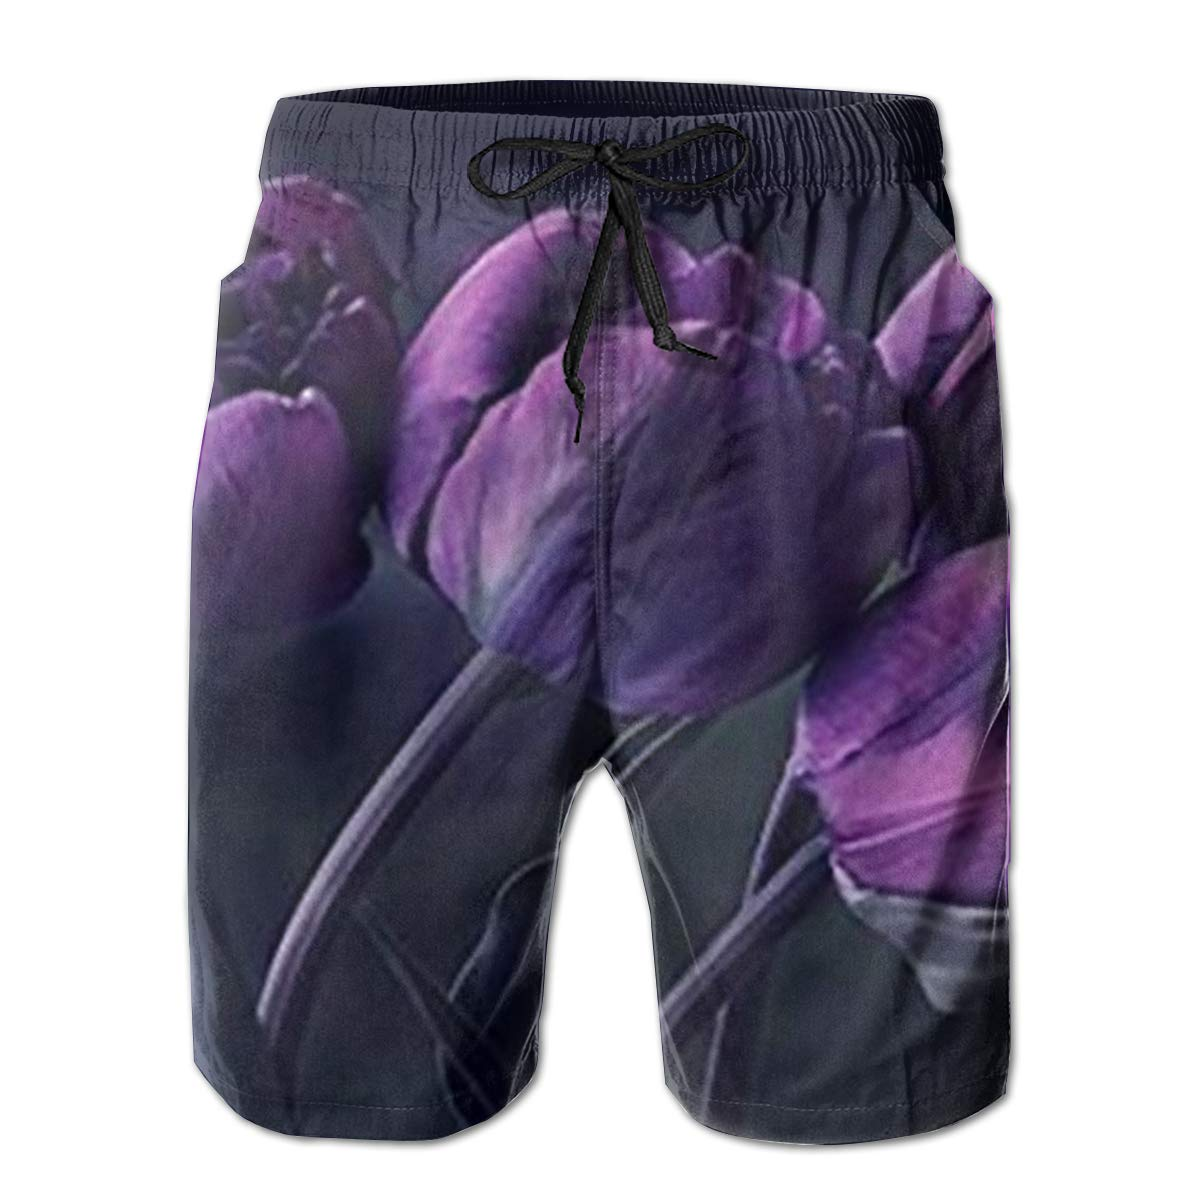 TR2YU7YT Dark Purple Tulip Flower Casual Mens Swim Trunks Quick Dry Printed Beach Shorts Summer Boardshorts Bathing Suits with Mesh Lining